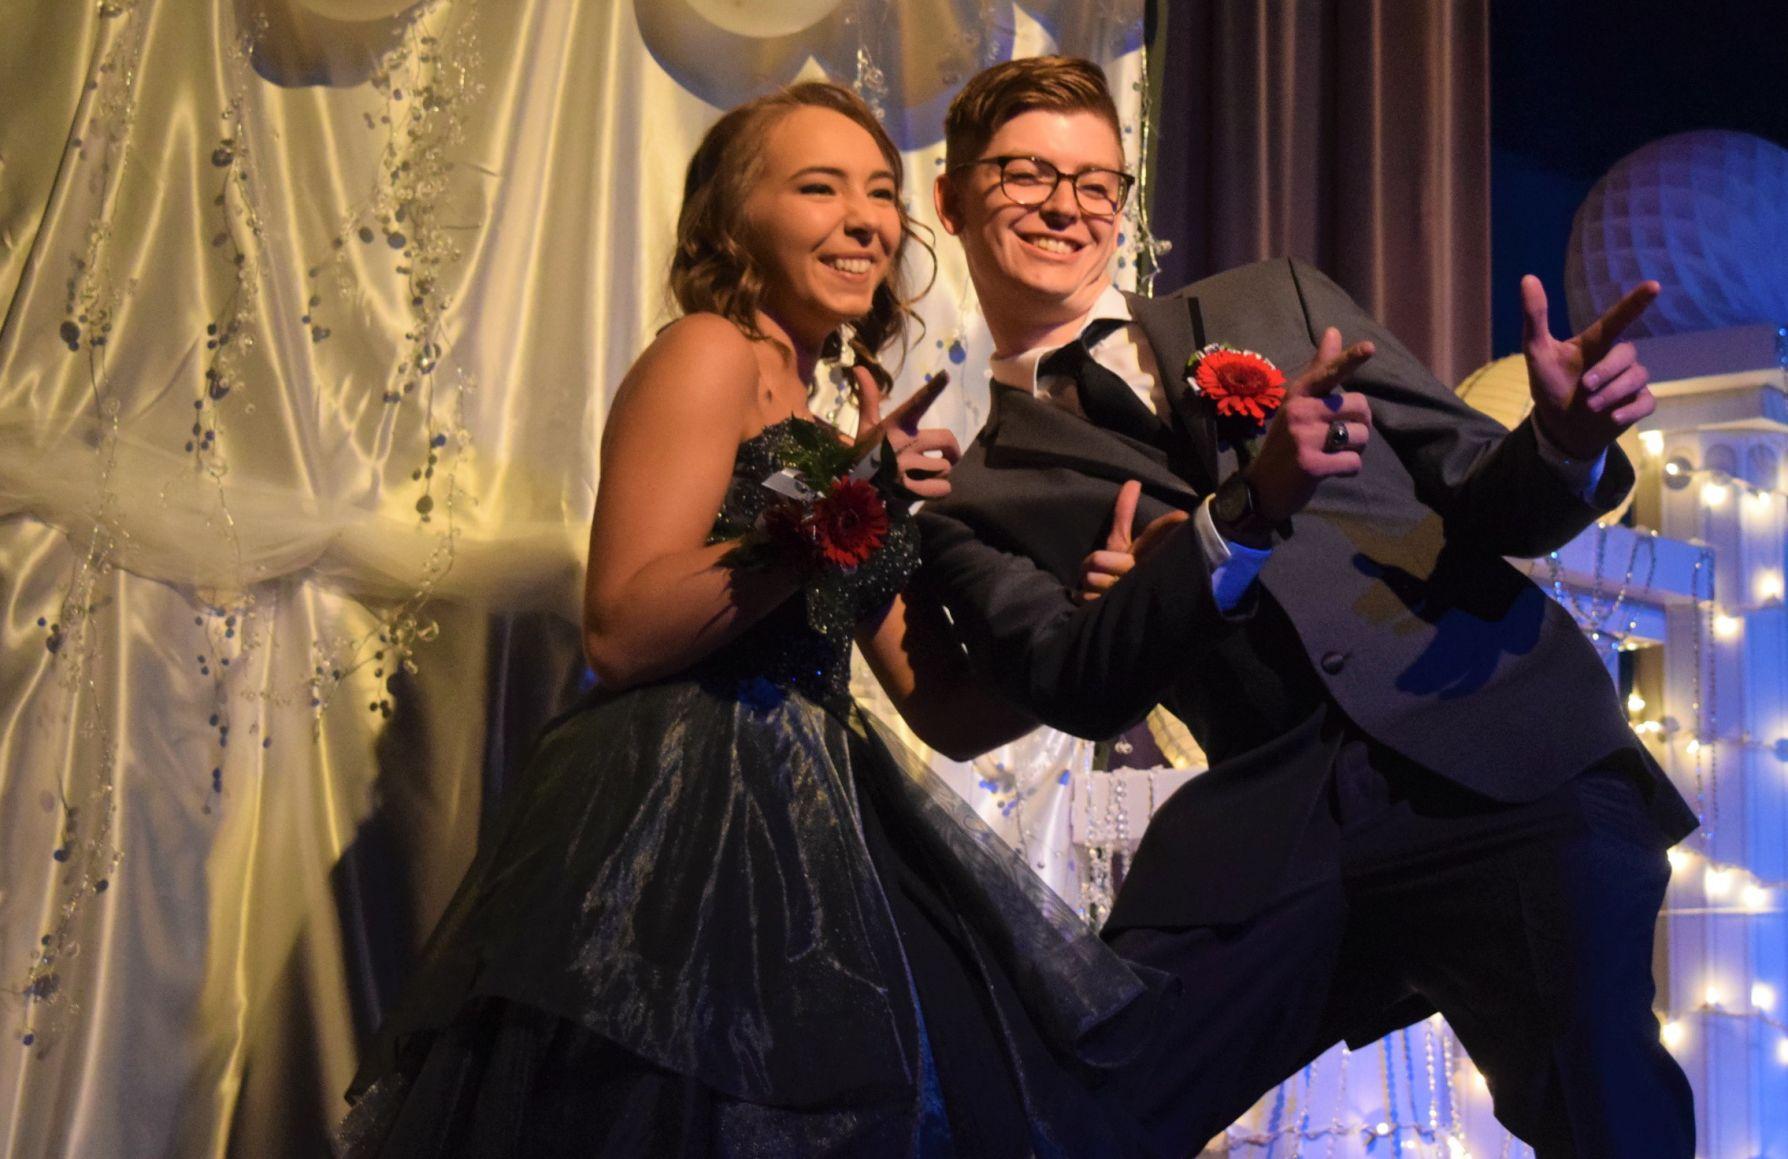 GALLERY: Clear Fork High School Prom 2019